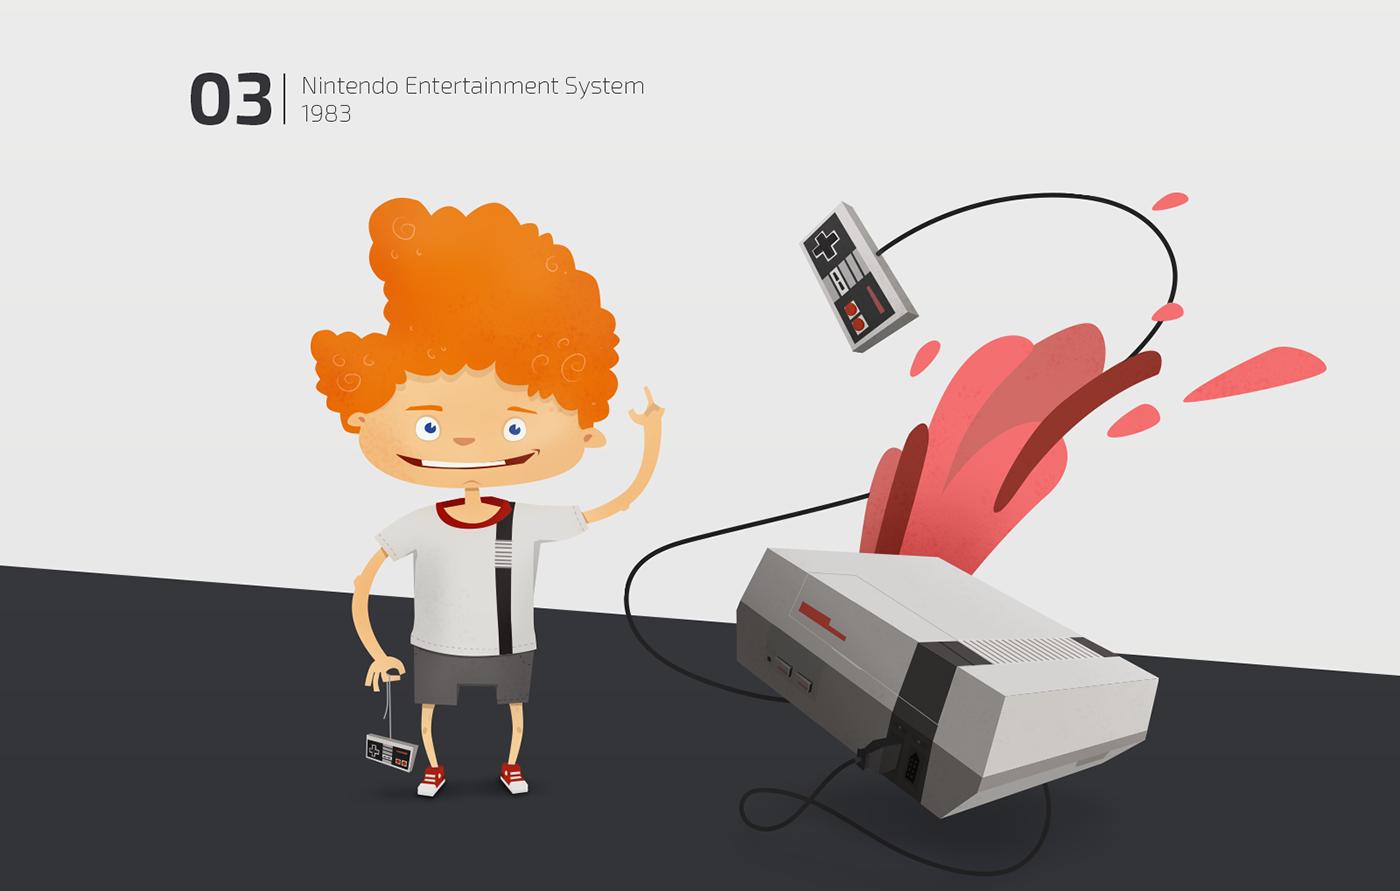 Games Gaming Character atari Nintendo playstation odyssey Superlevel Retro